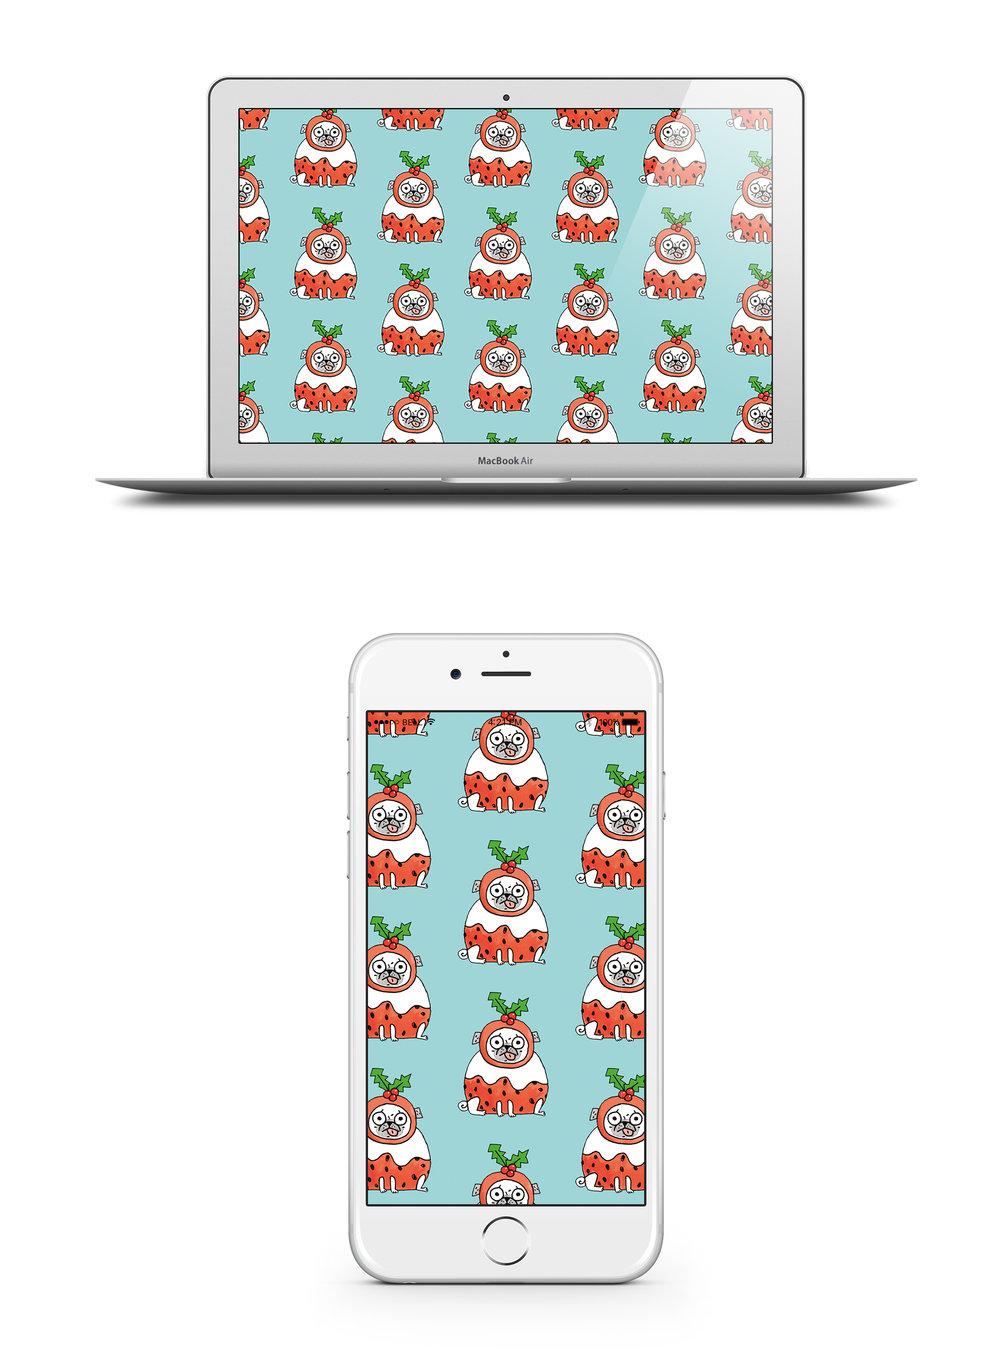 Festive-Wallpaper---Gemma Correll--Demo.jpg